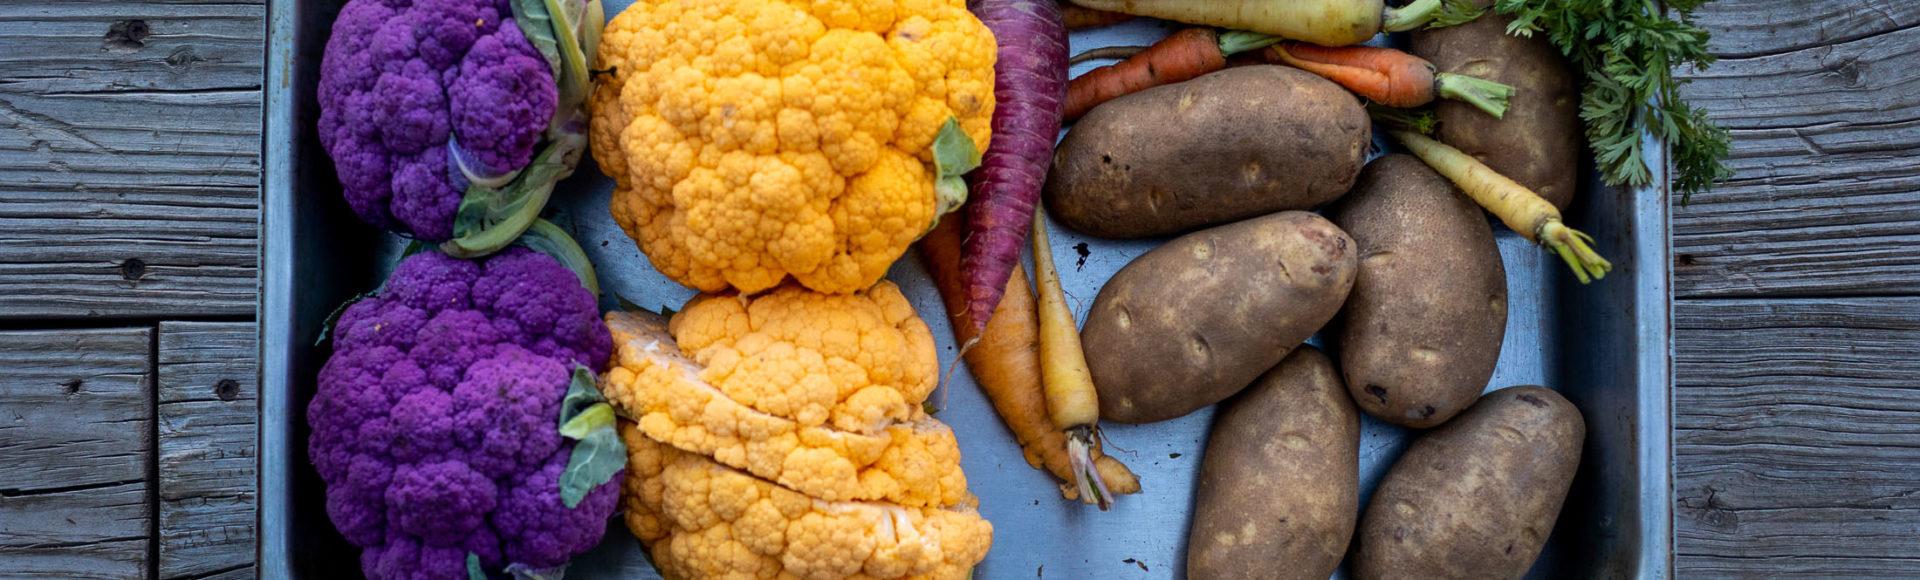 Local produce - Dunton